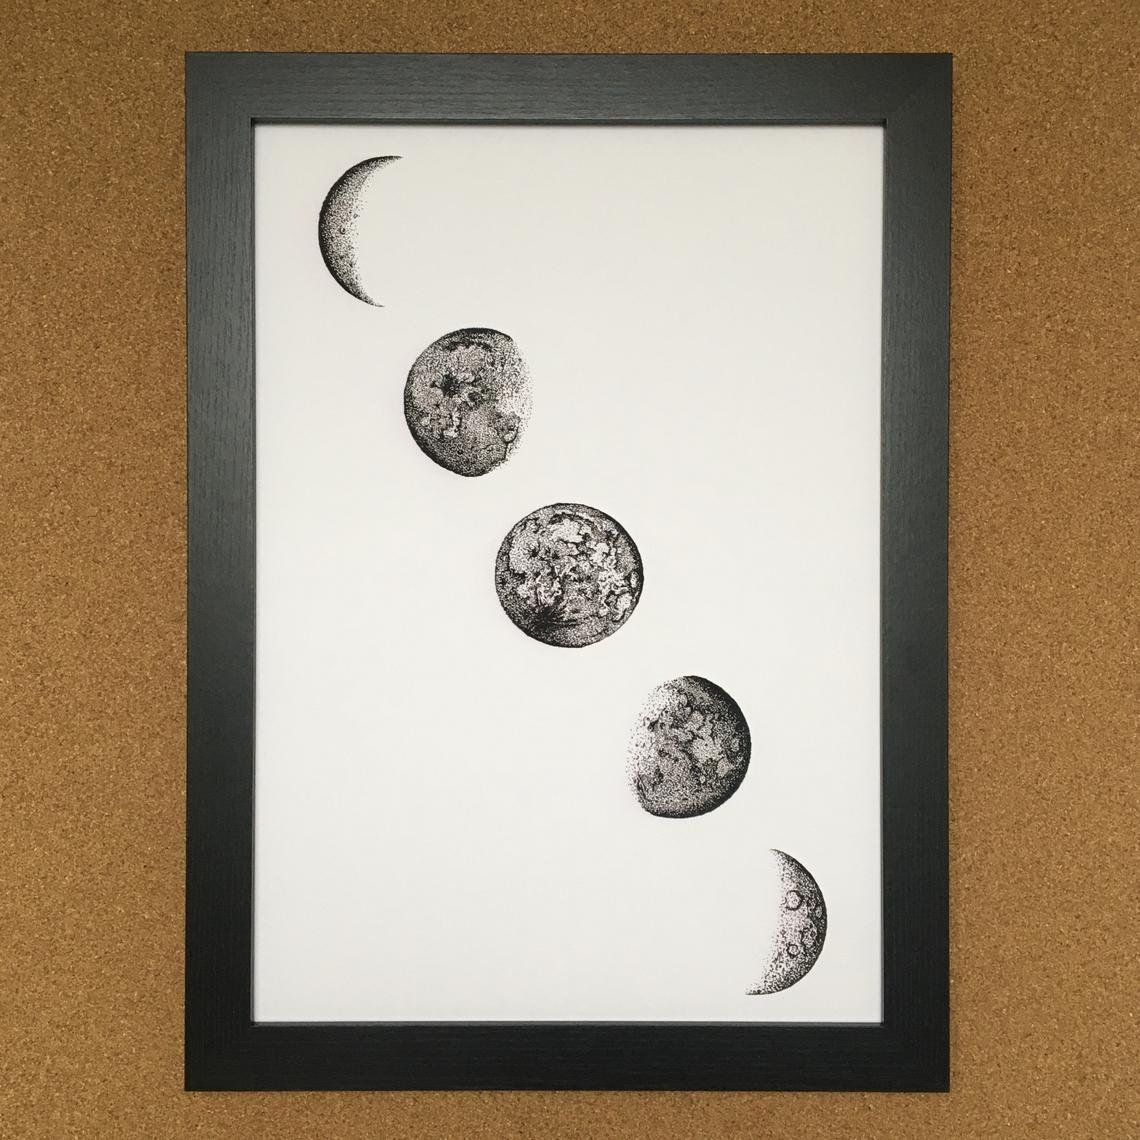 https://www.etsy.com/uk/listing/895158275/phases-of-the-moon-wall-art-artwork-for